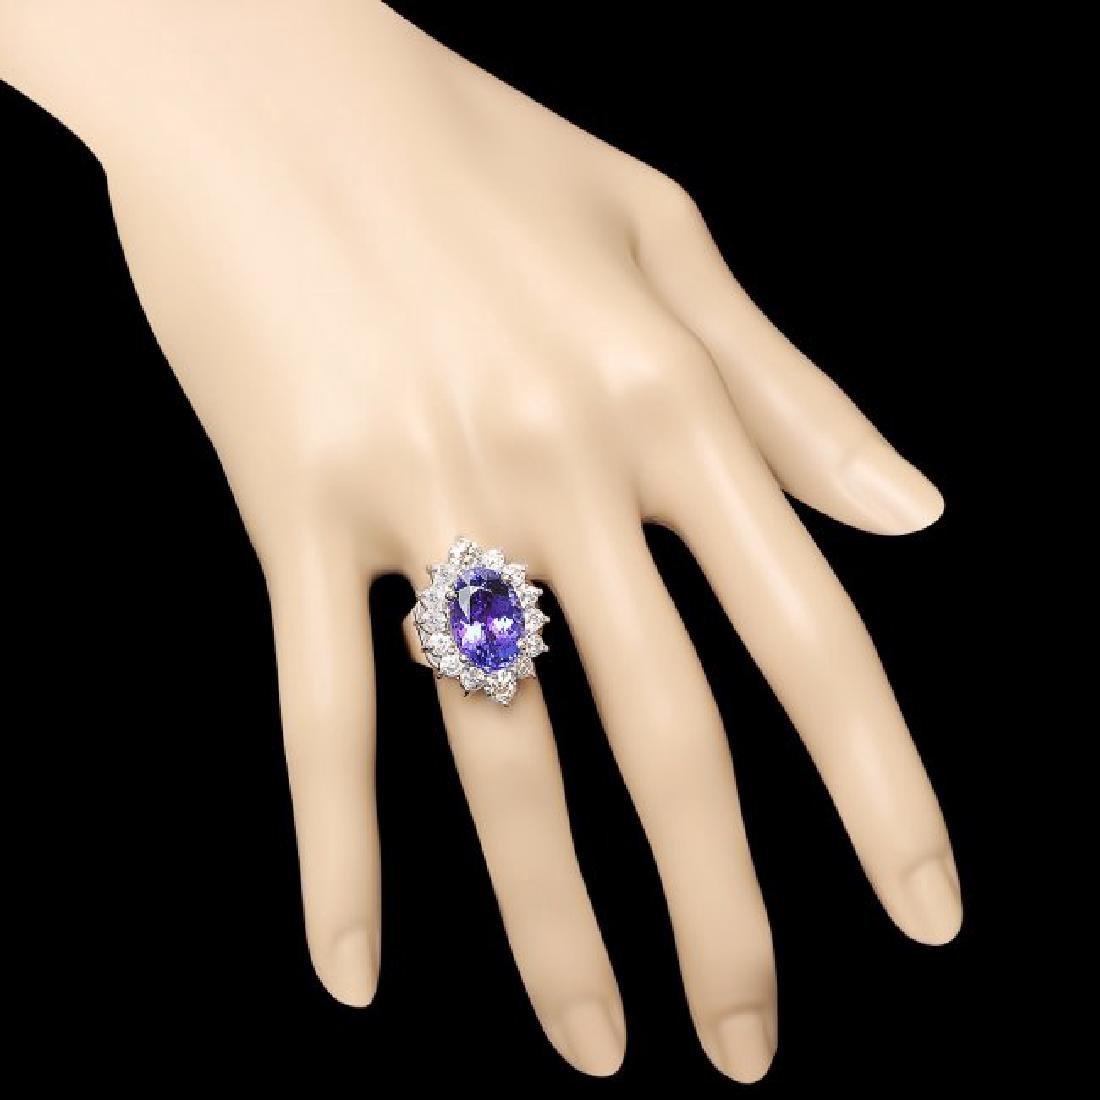 14k Gold 8.50ct Tanzanite 2.00ct Diamond Ring - 4